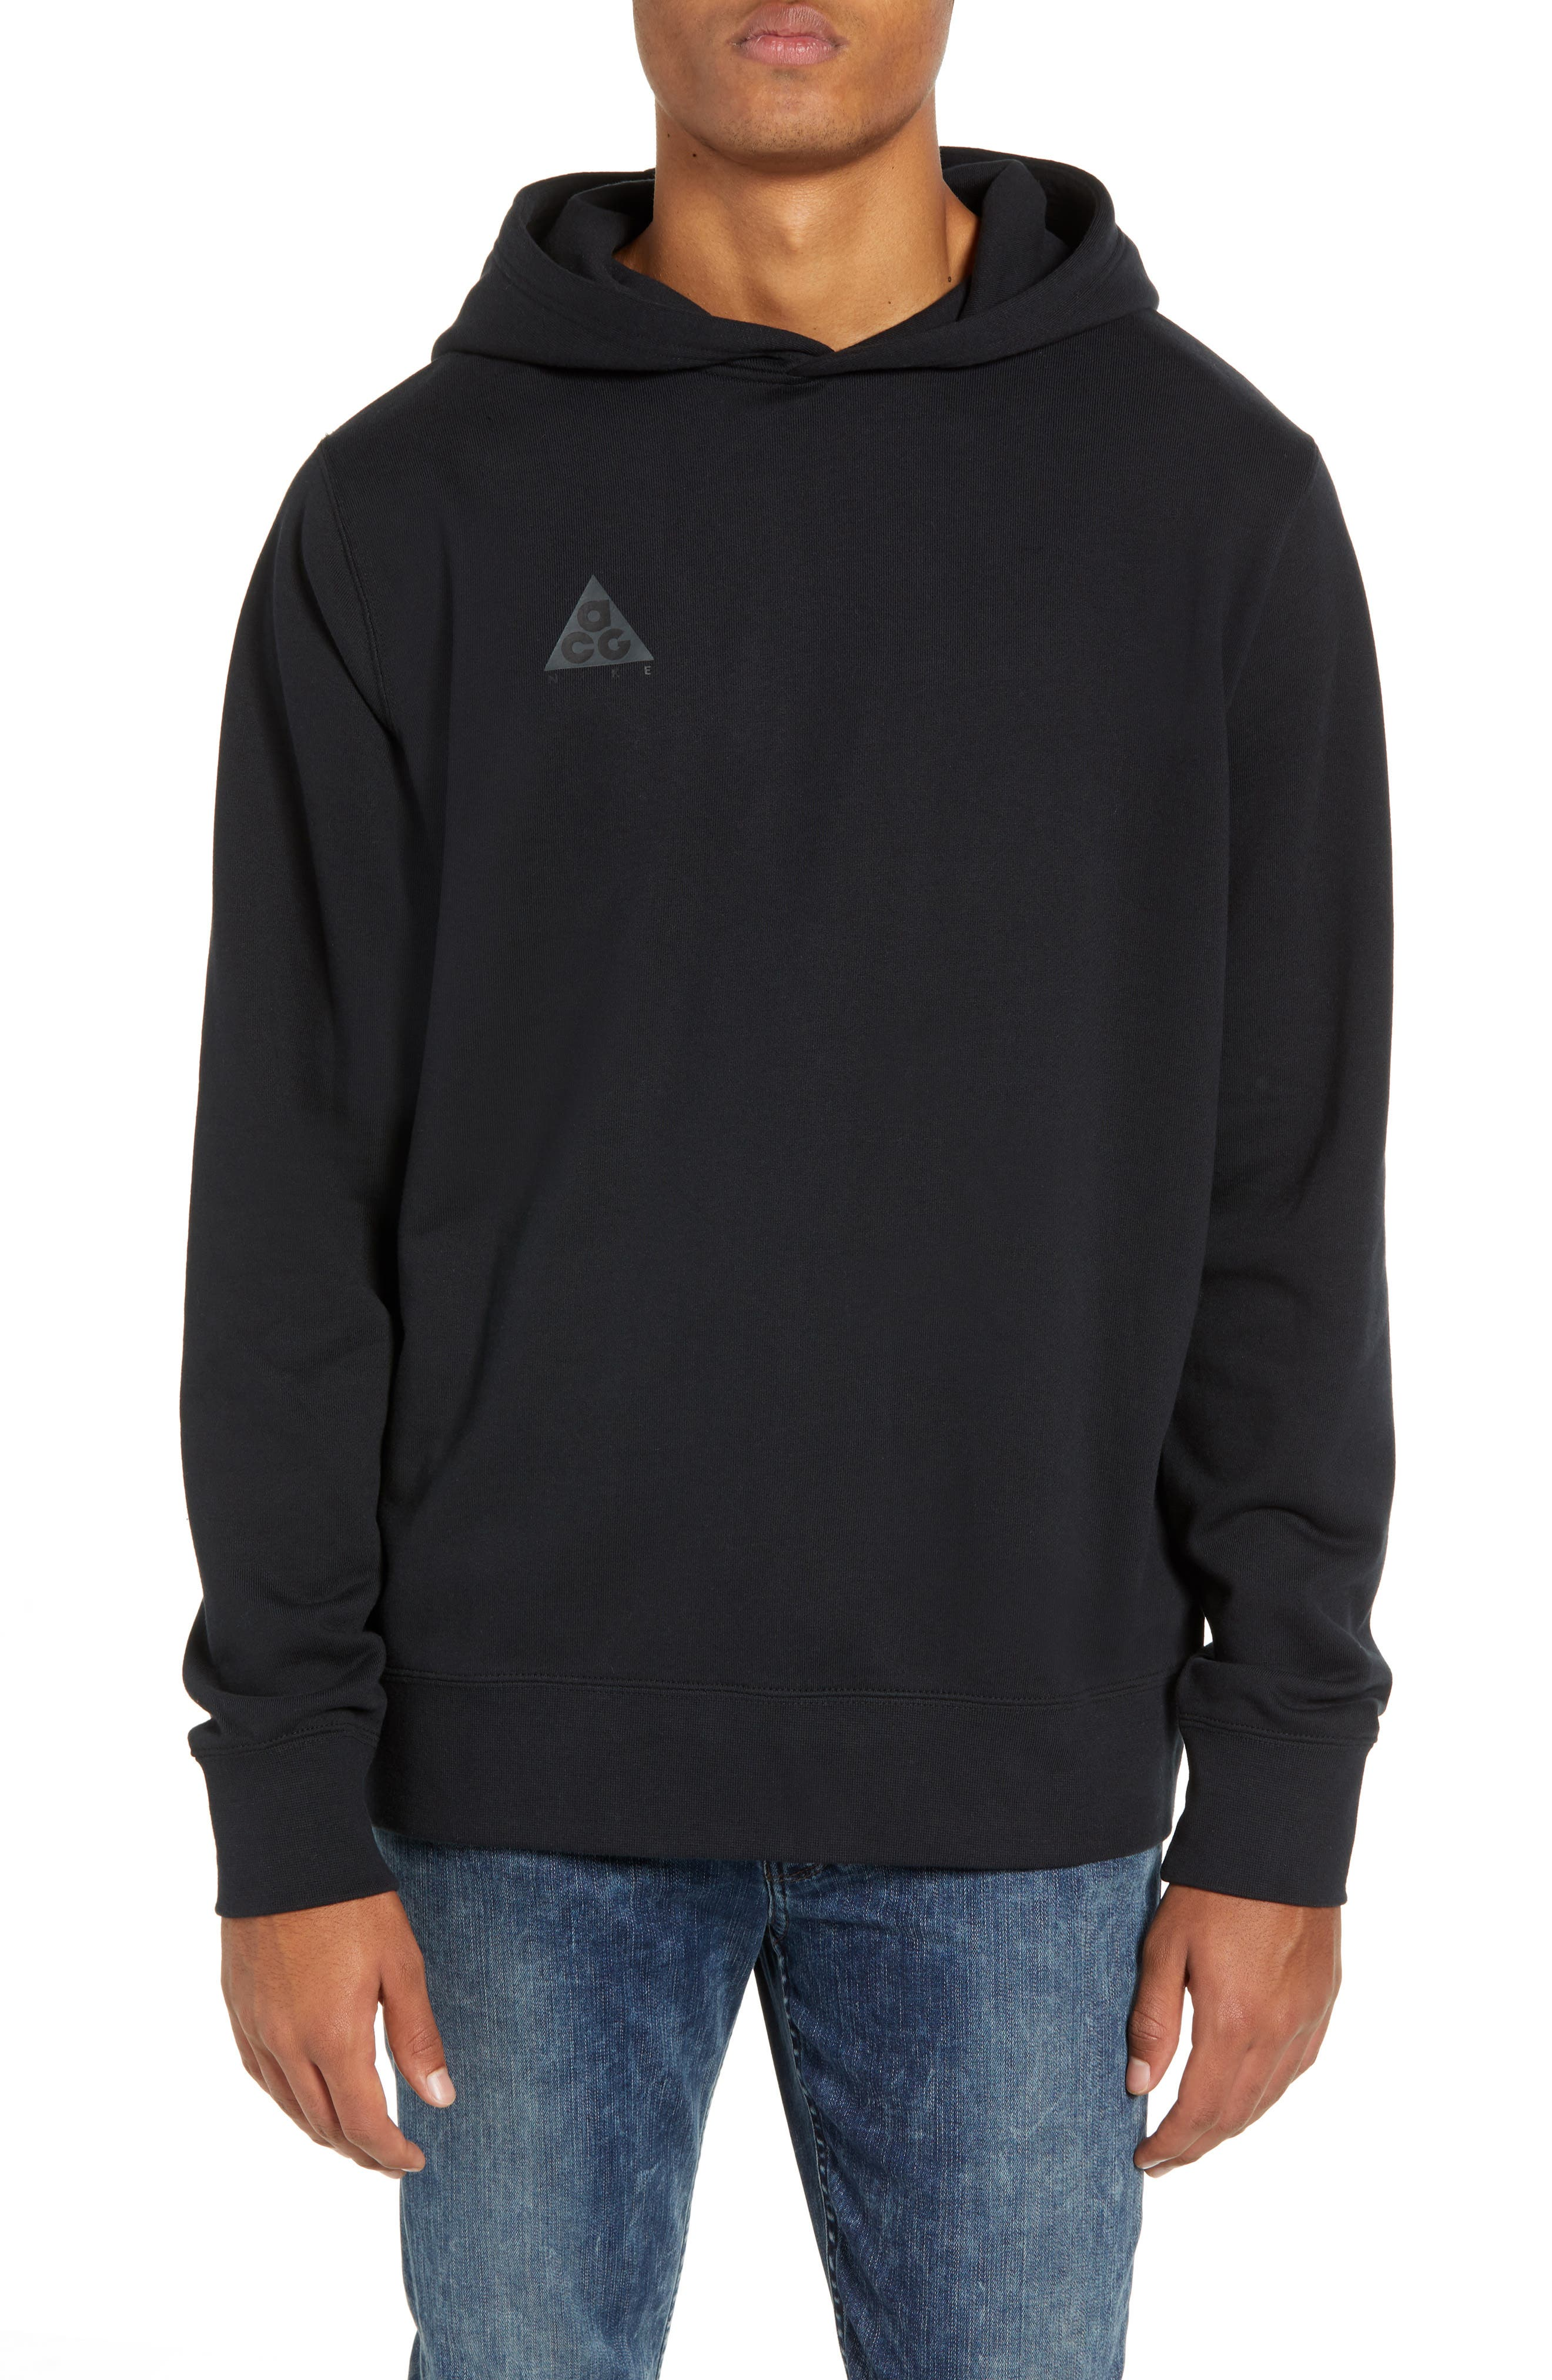 Sportswear ACG Pullover Hoodie,                         Main,                         color, BLACK/ BLACK